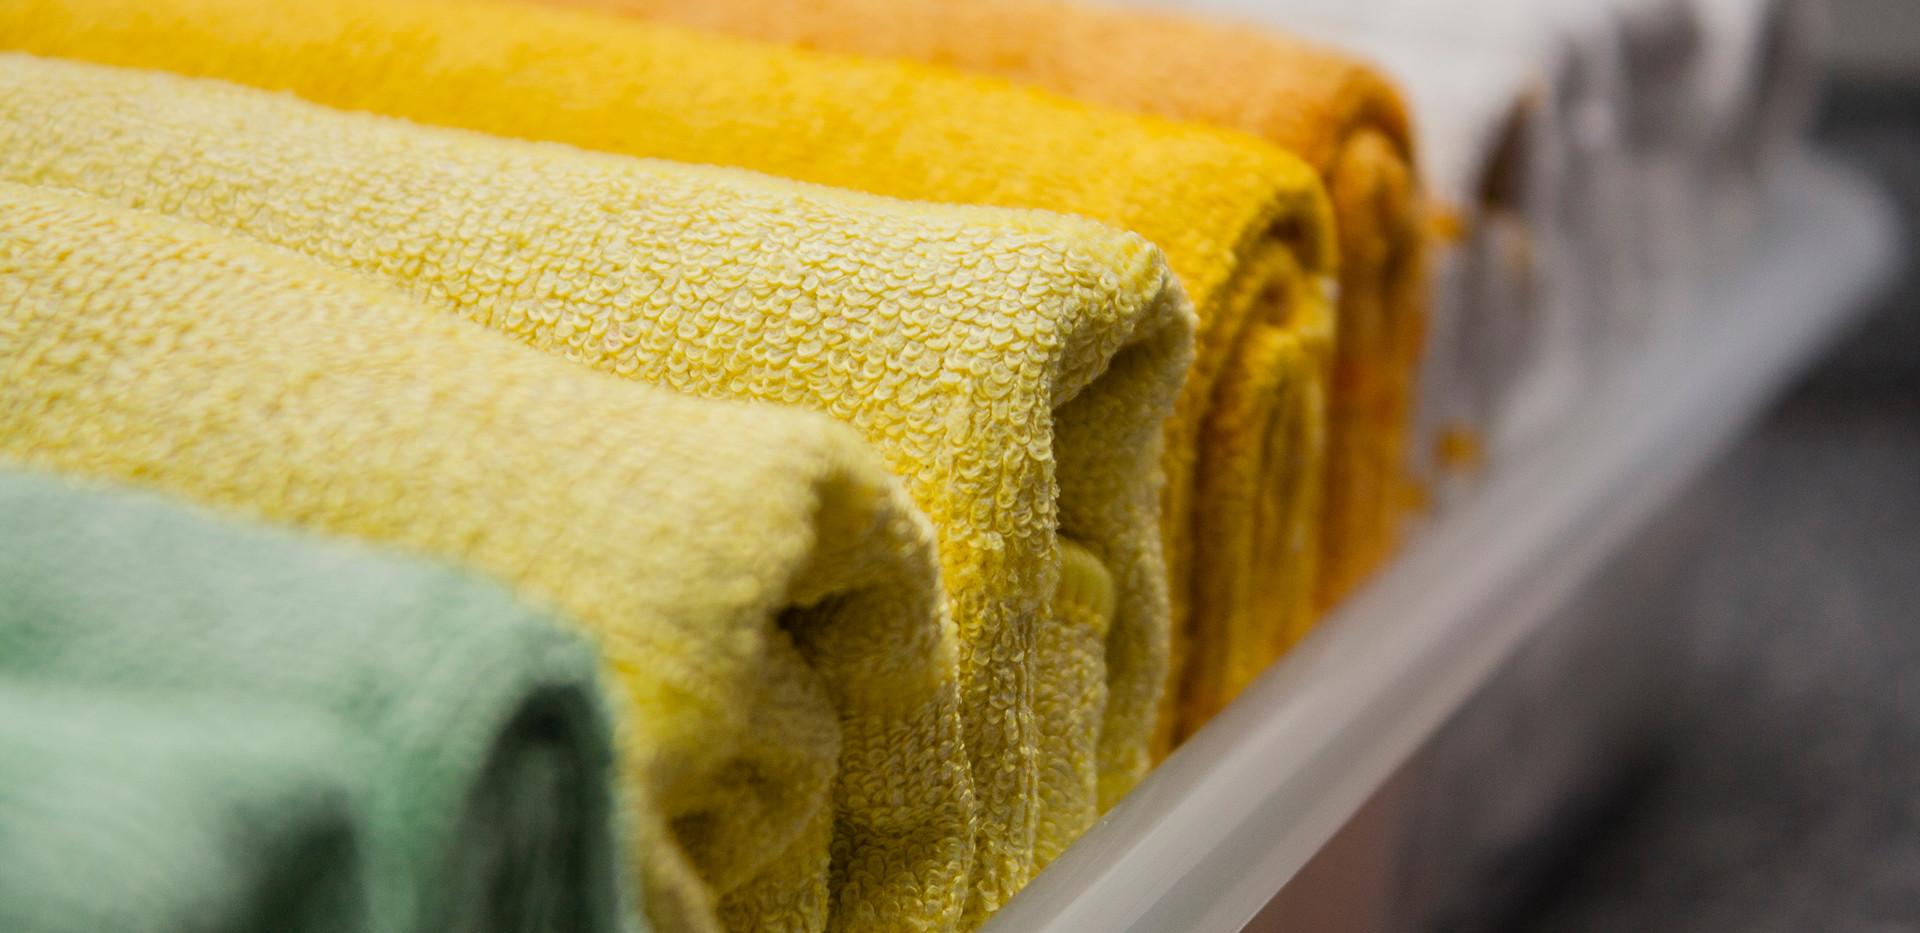 geordnete Handtücher